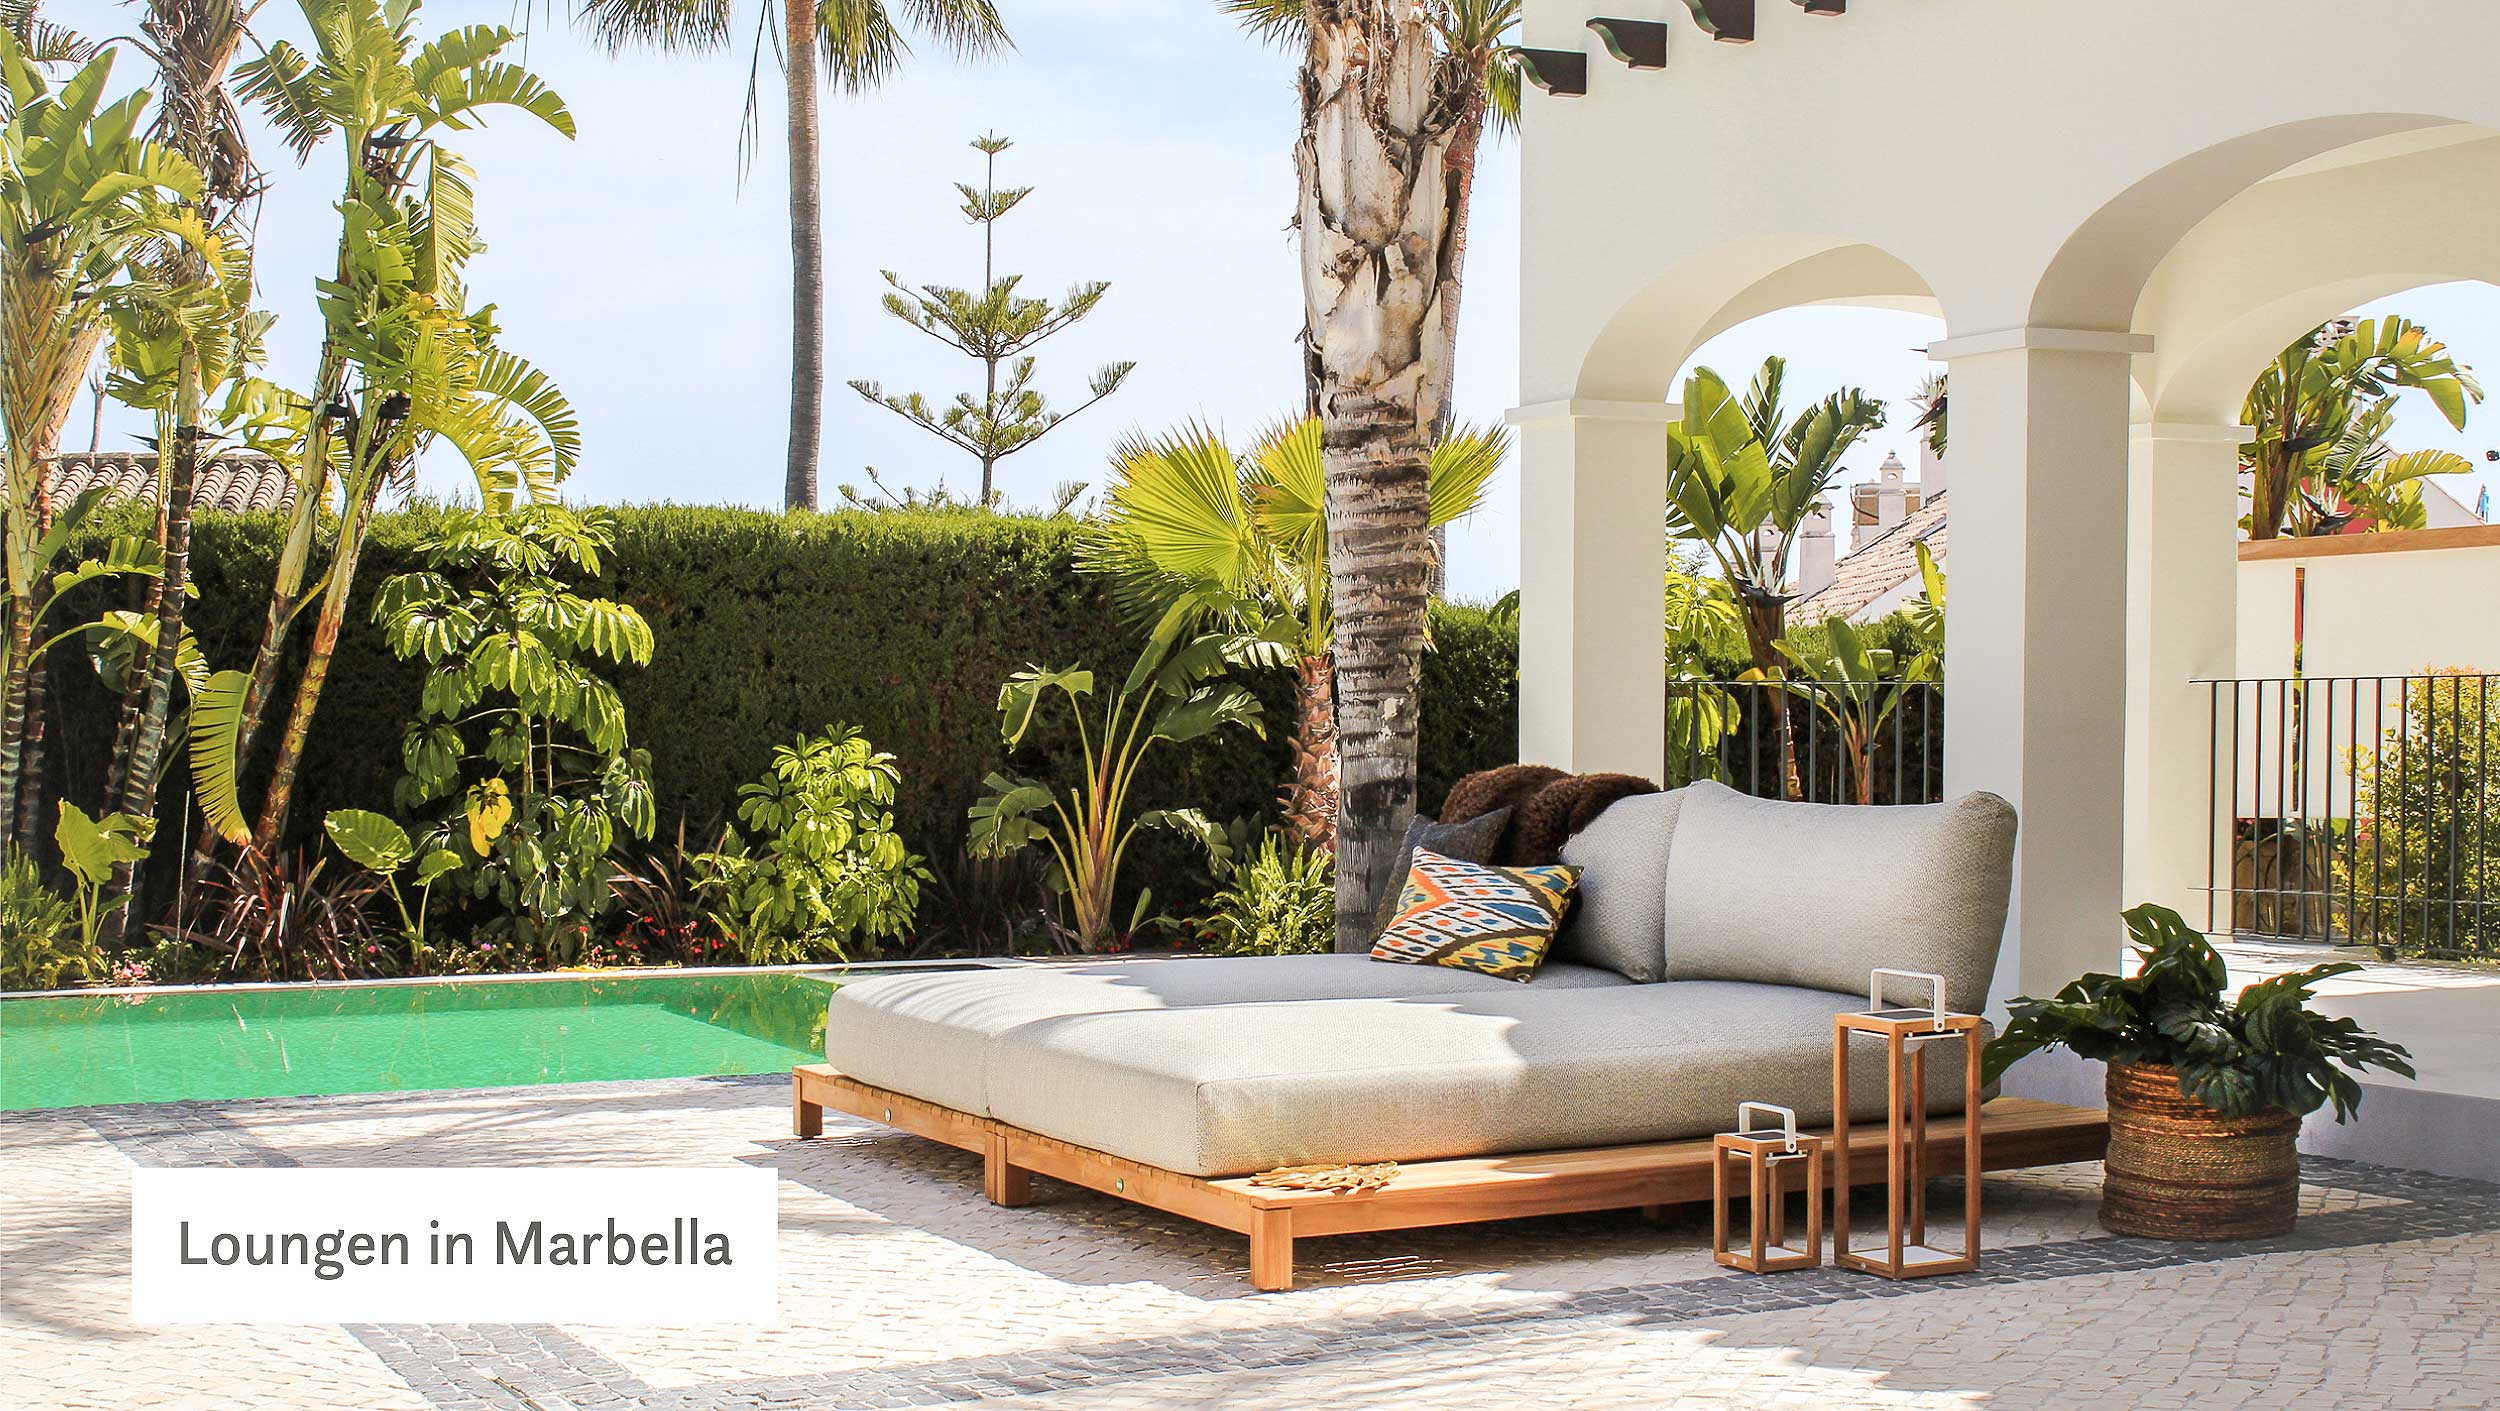 SUNS-CarrouselMarbella-header-deel_1-2